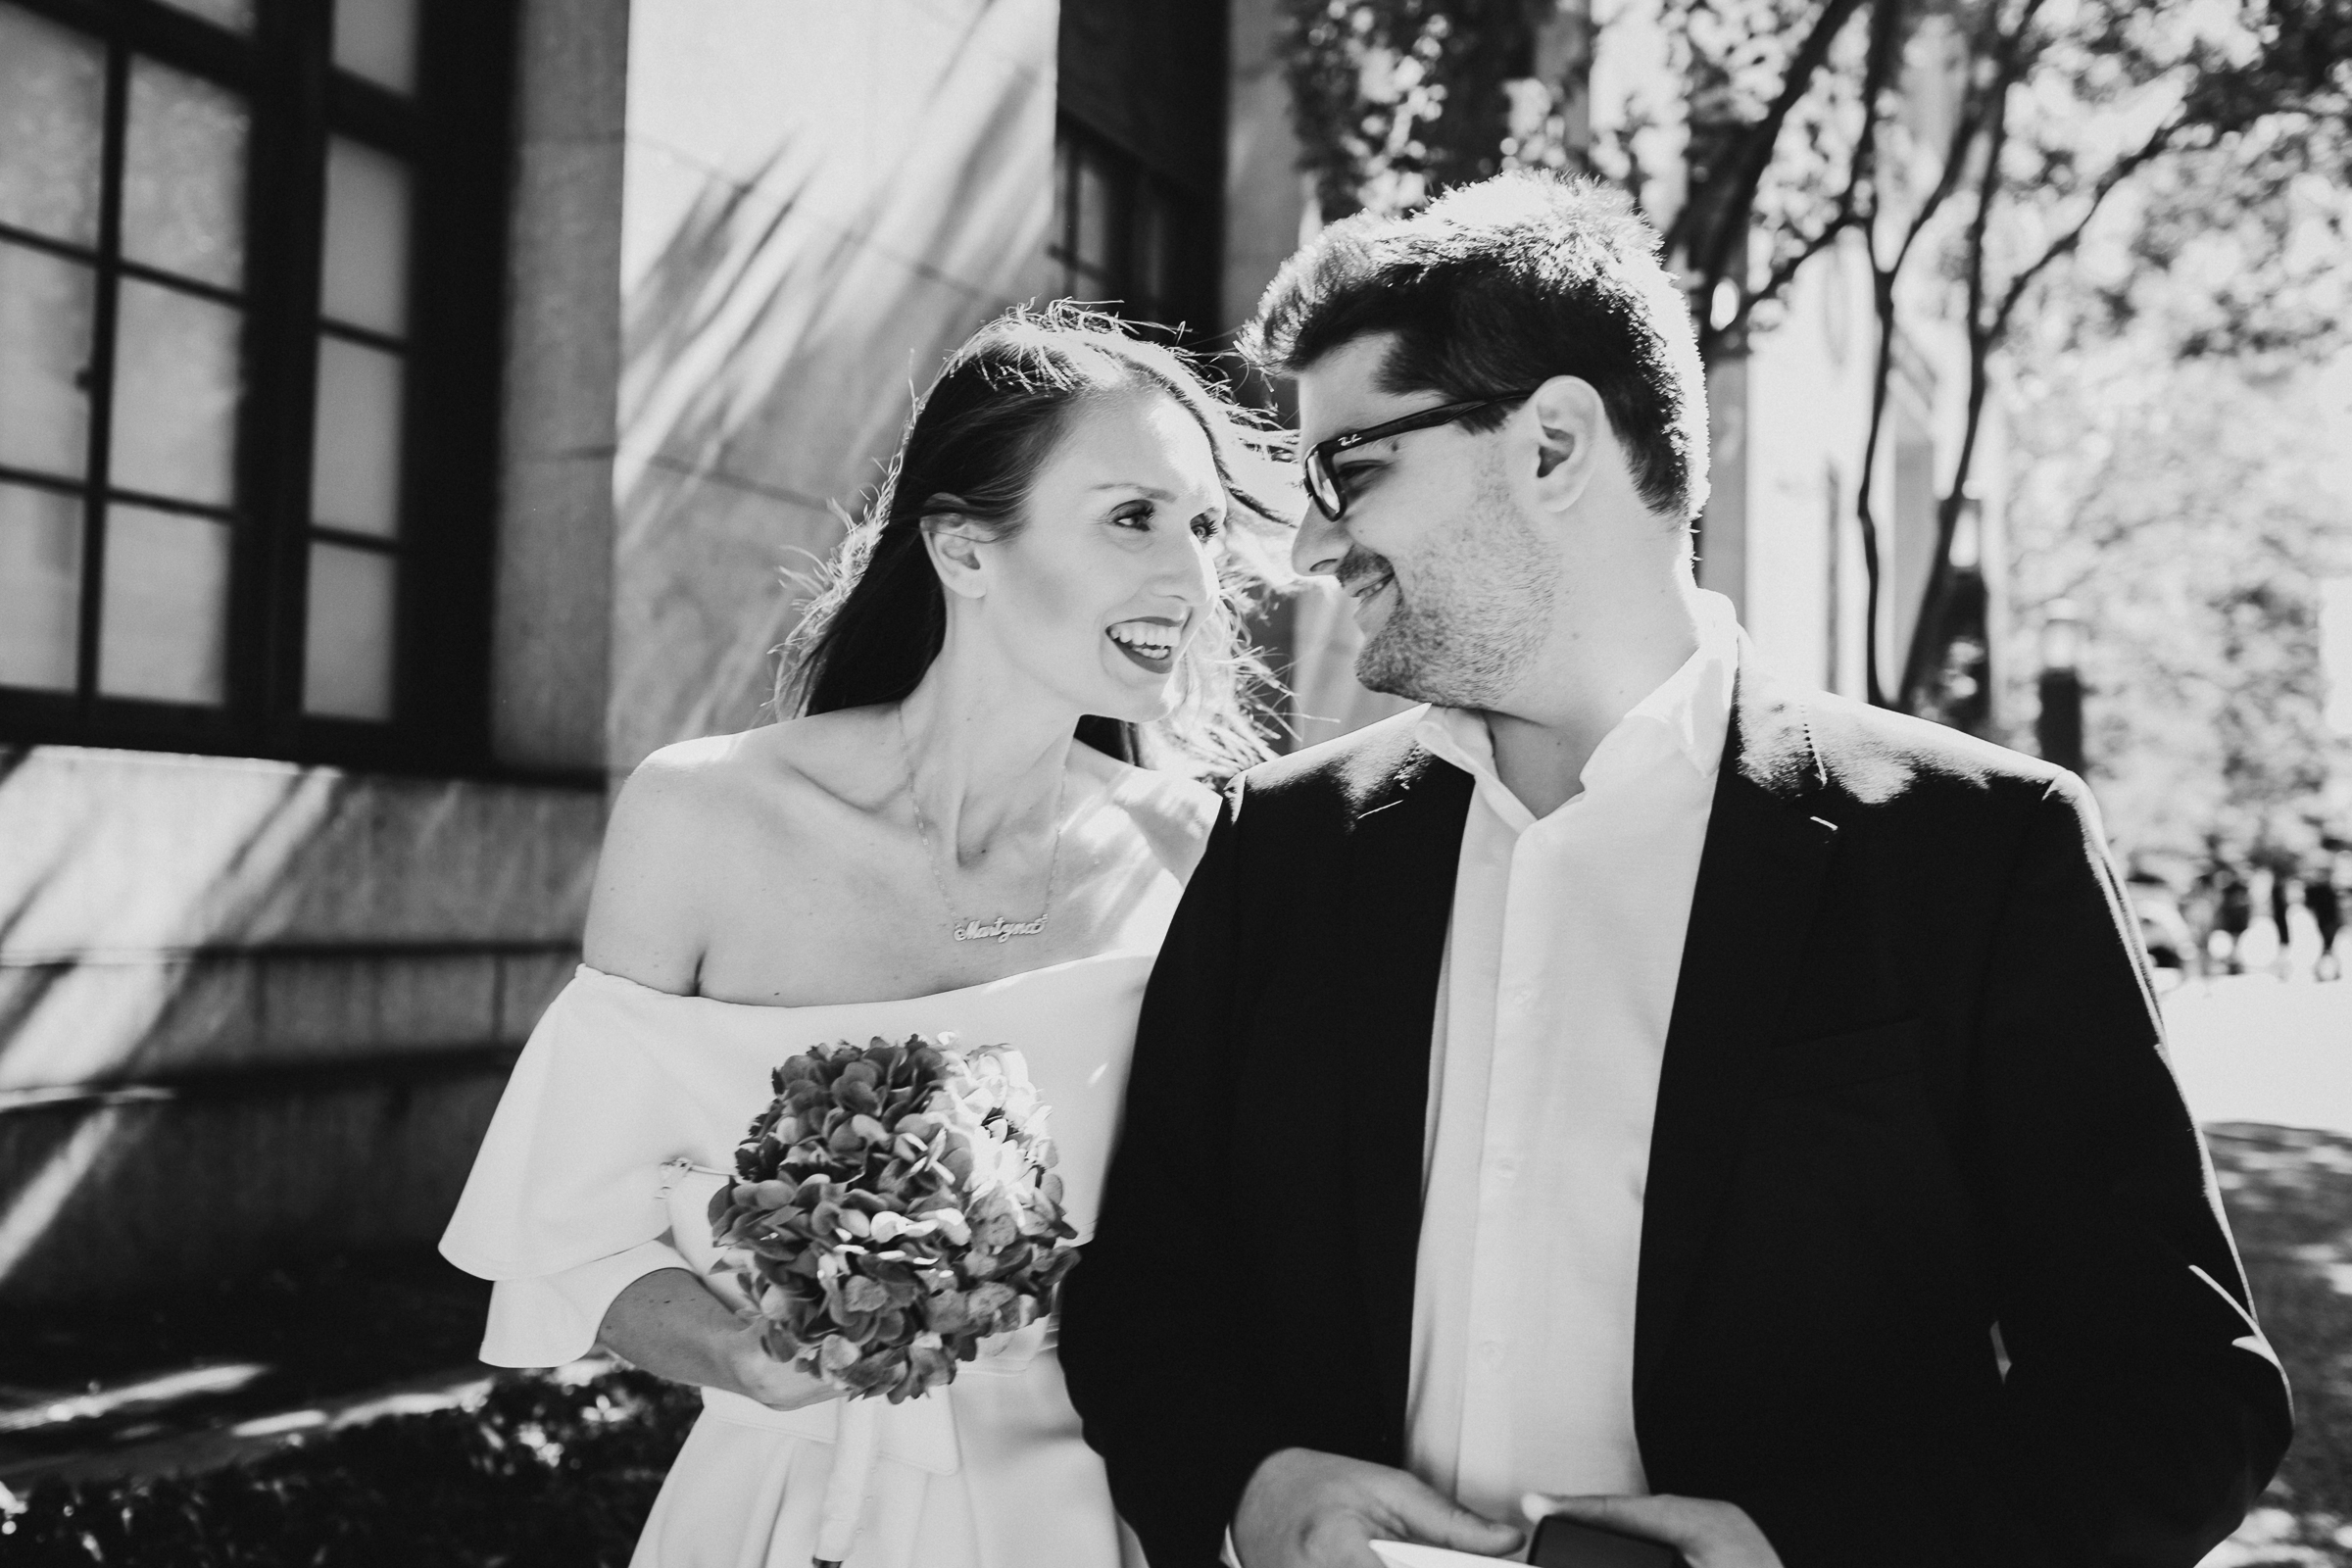 New-York-City-Hall-Elopement-NYC-Documentary-Wedding-Photographer-24.jpg